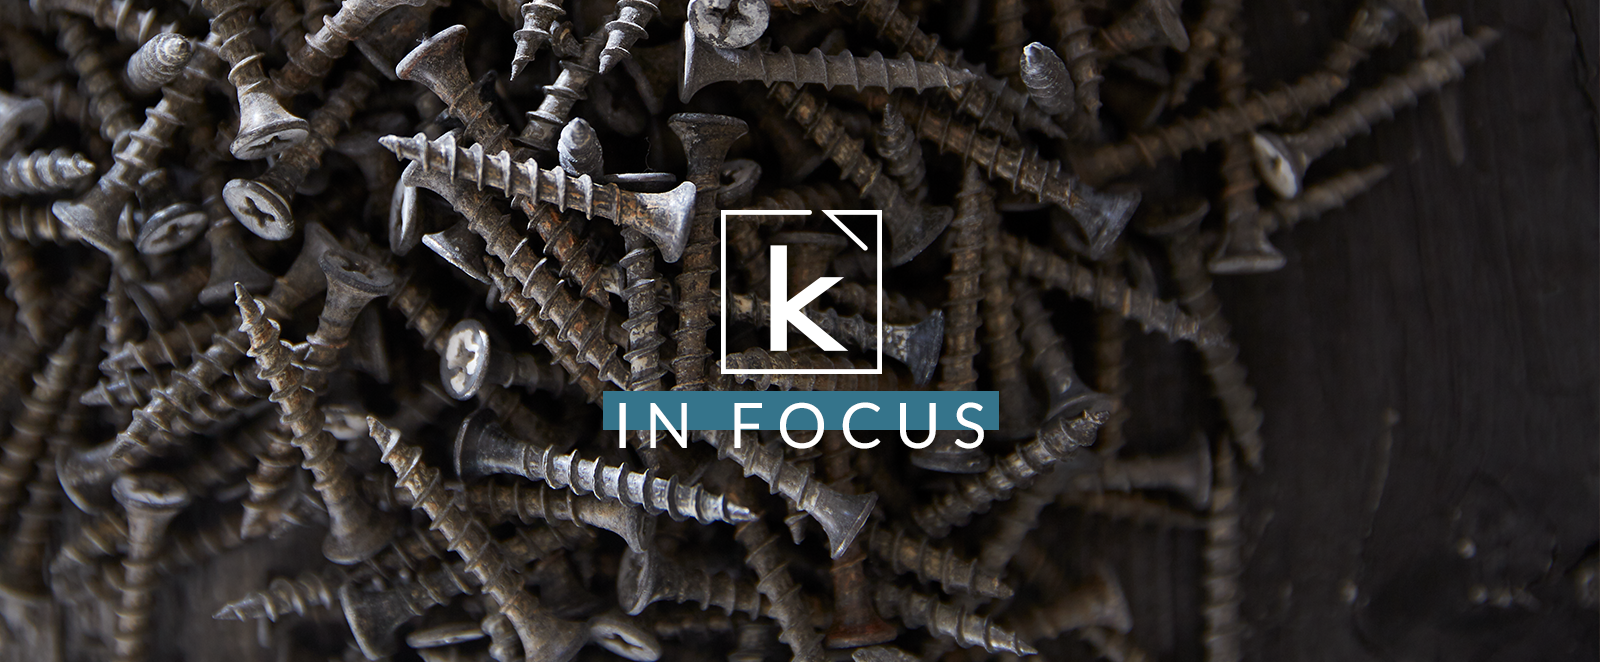 close-up-power-tools-screws-industrial